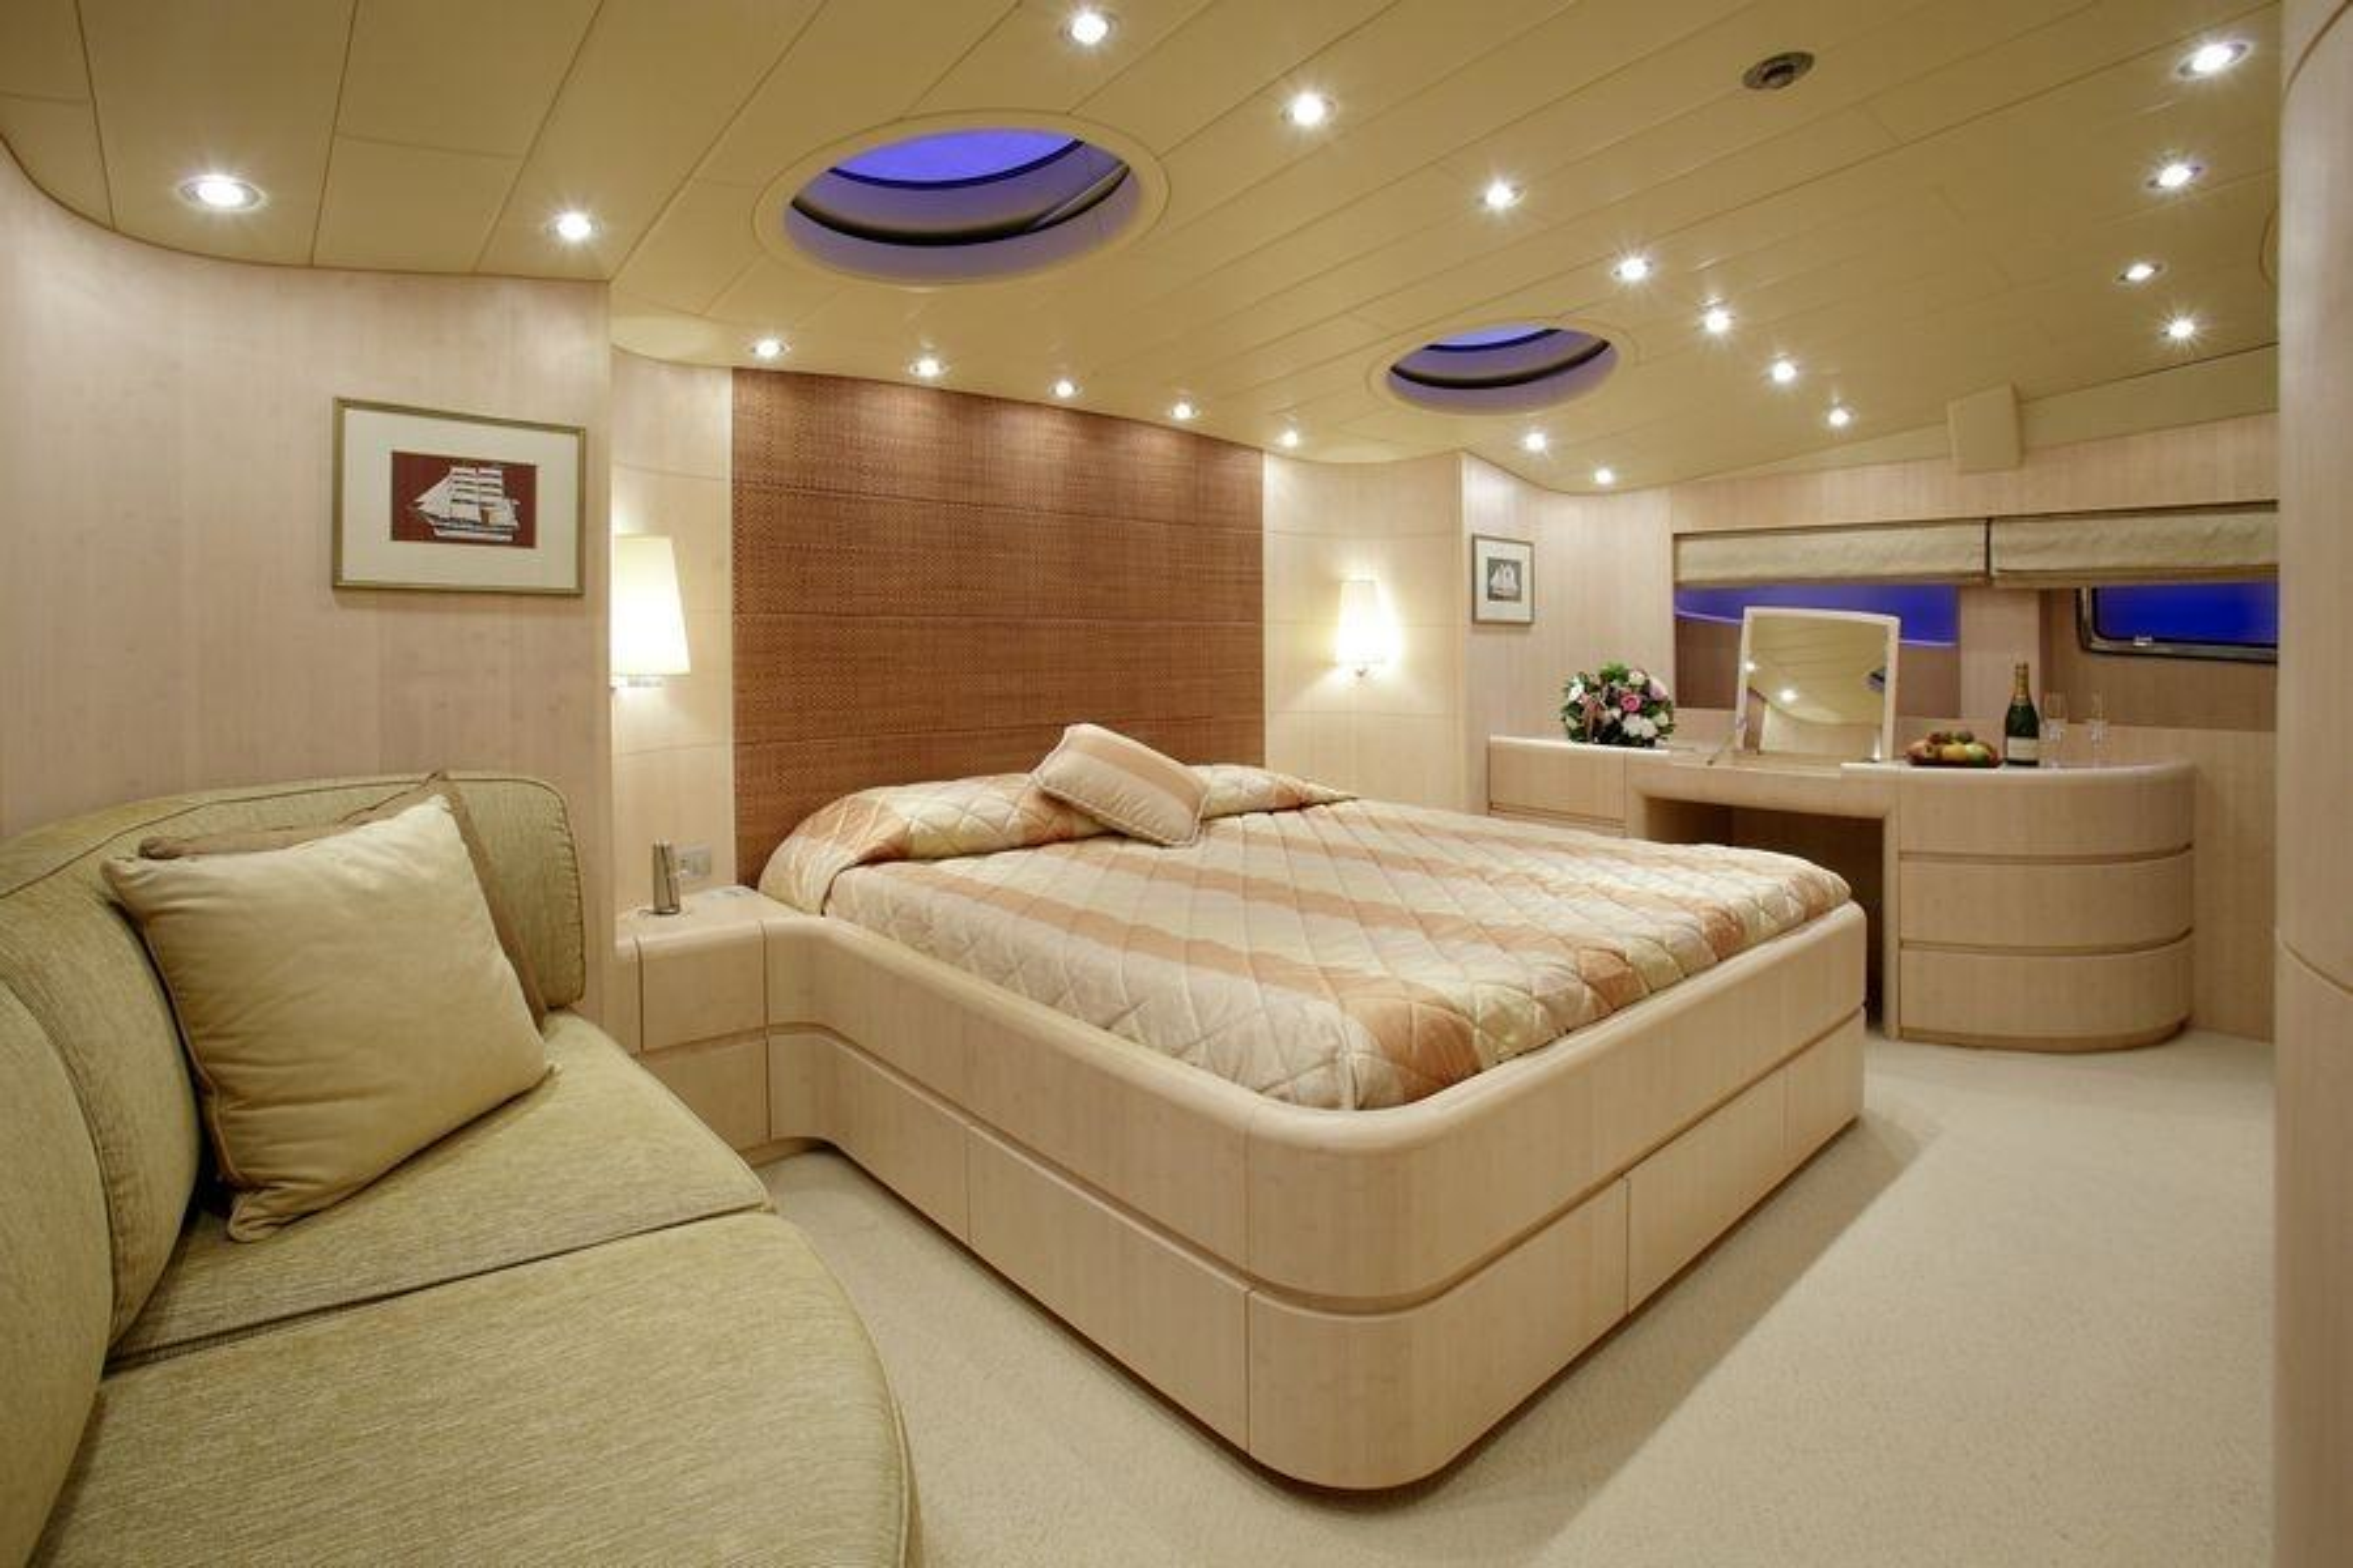 GLAROS VIP cabin